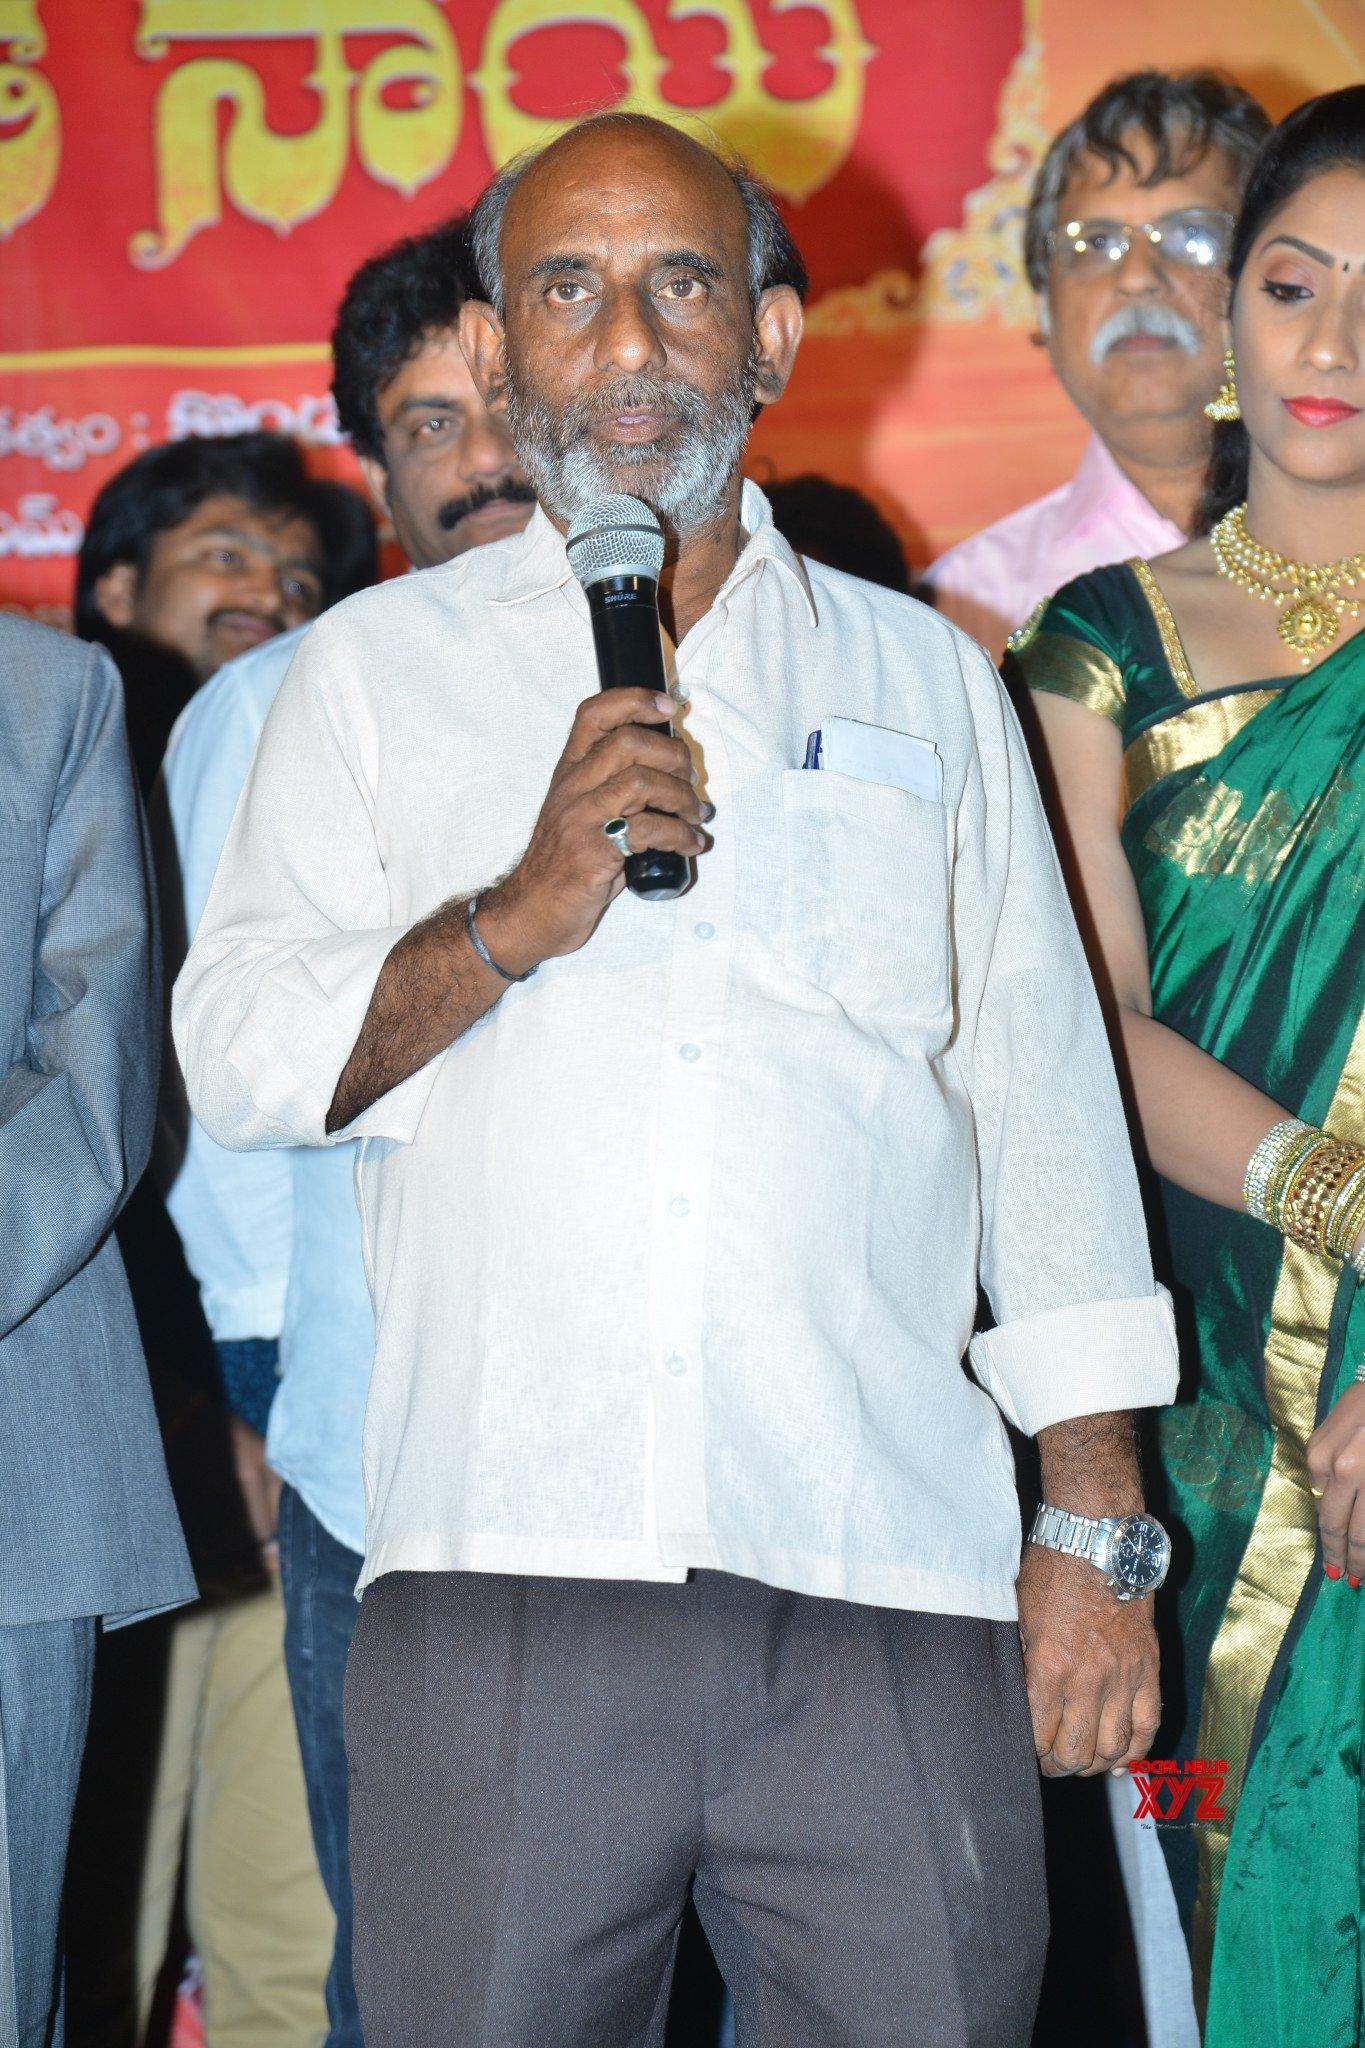 Pratyaksha Daivam Shirdi Sai Movie Audio Launch Gallery